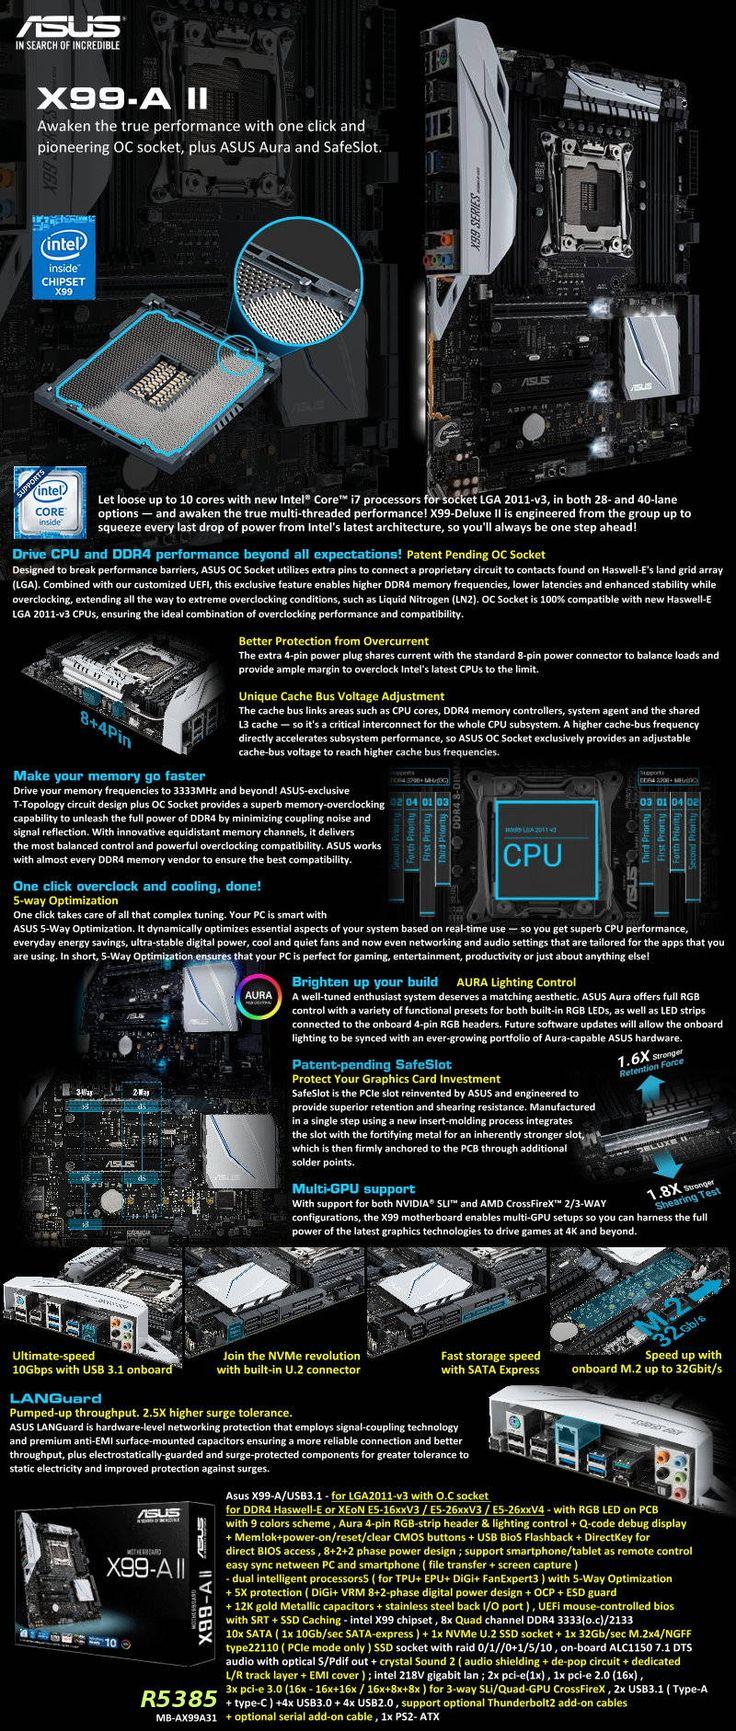 Asus X99-A/USB3.1 - for LGA201